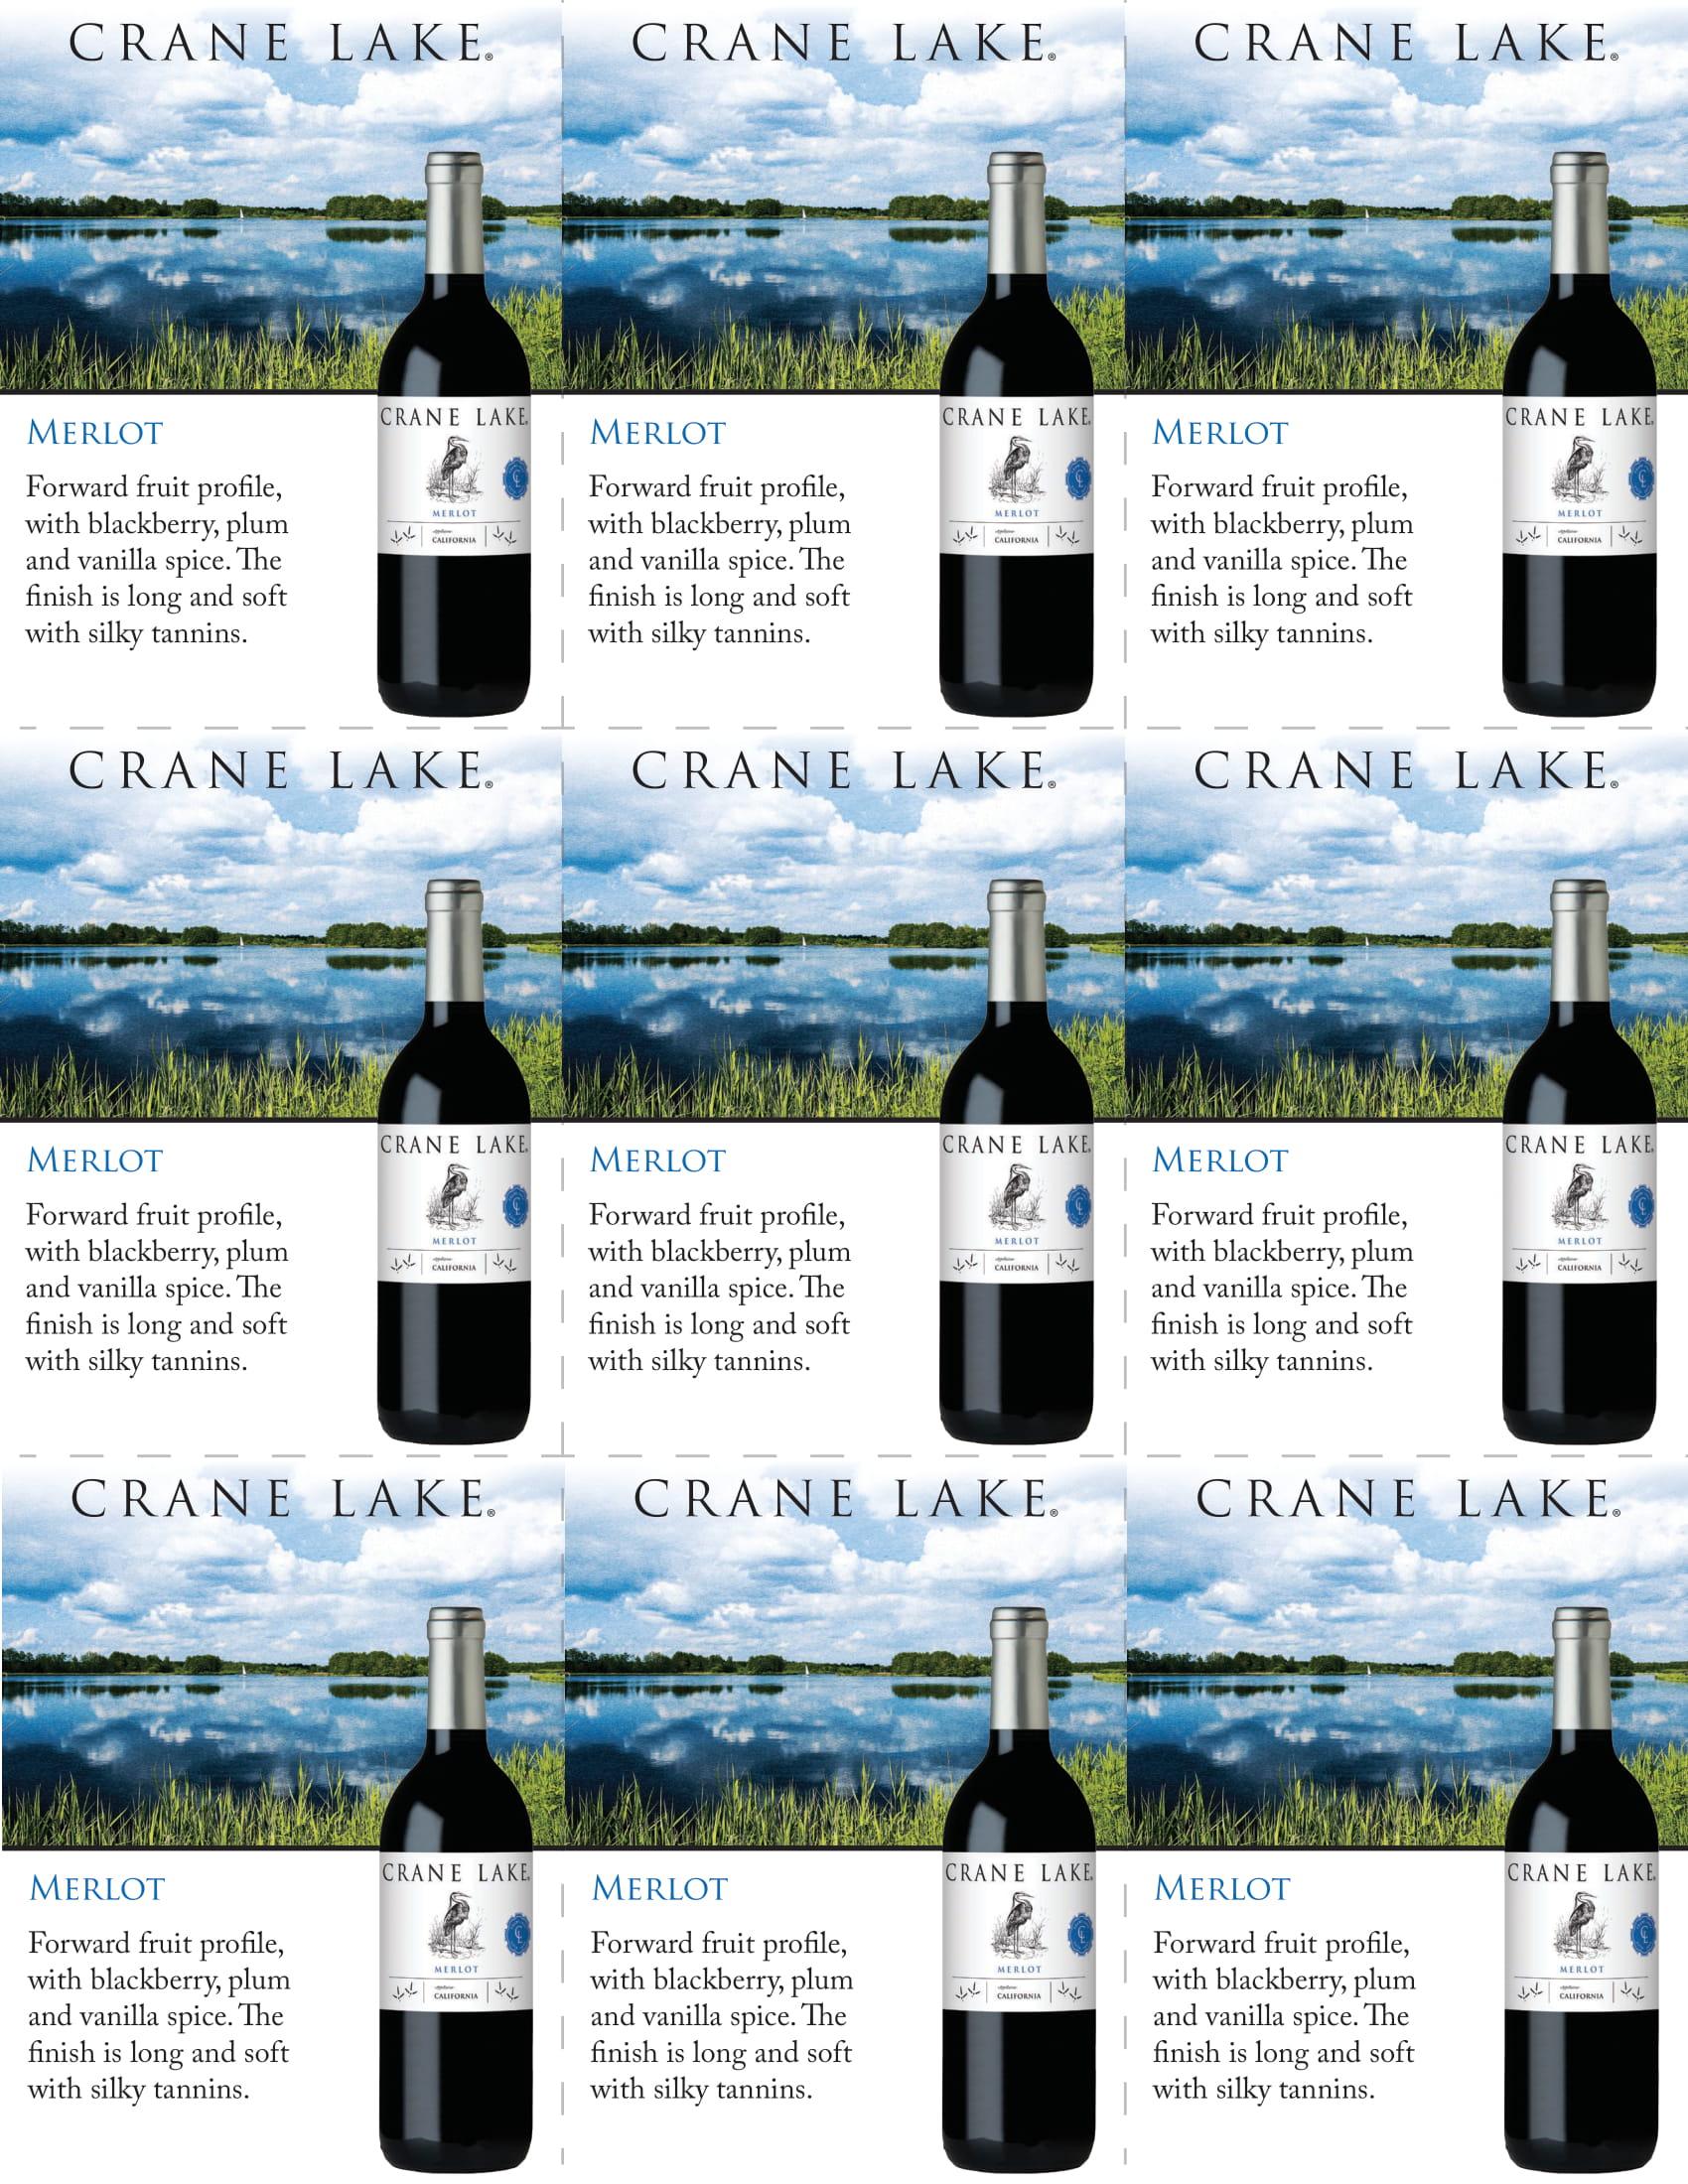 Crane Lake Merlot Shelf Talkers